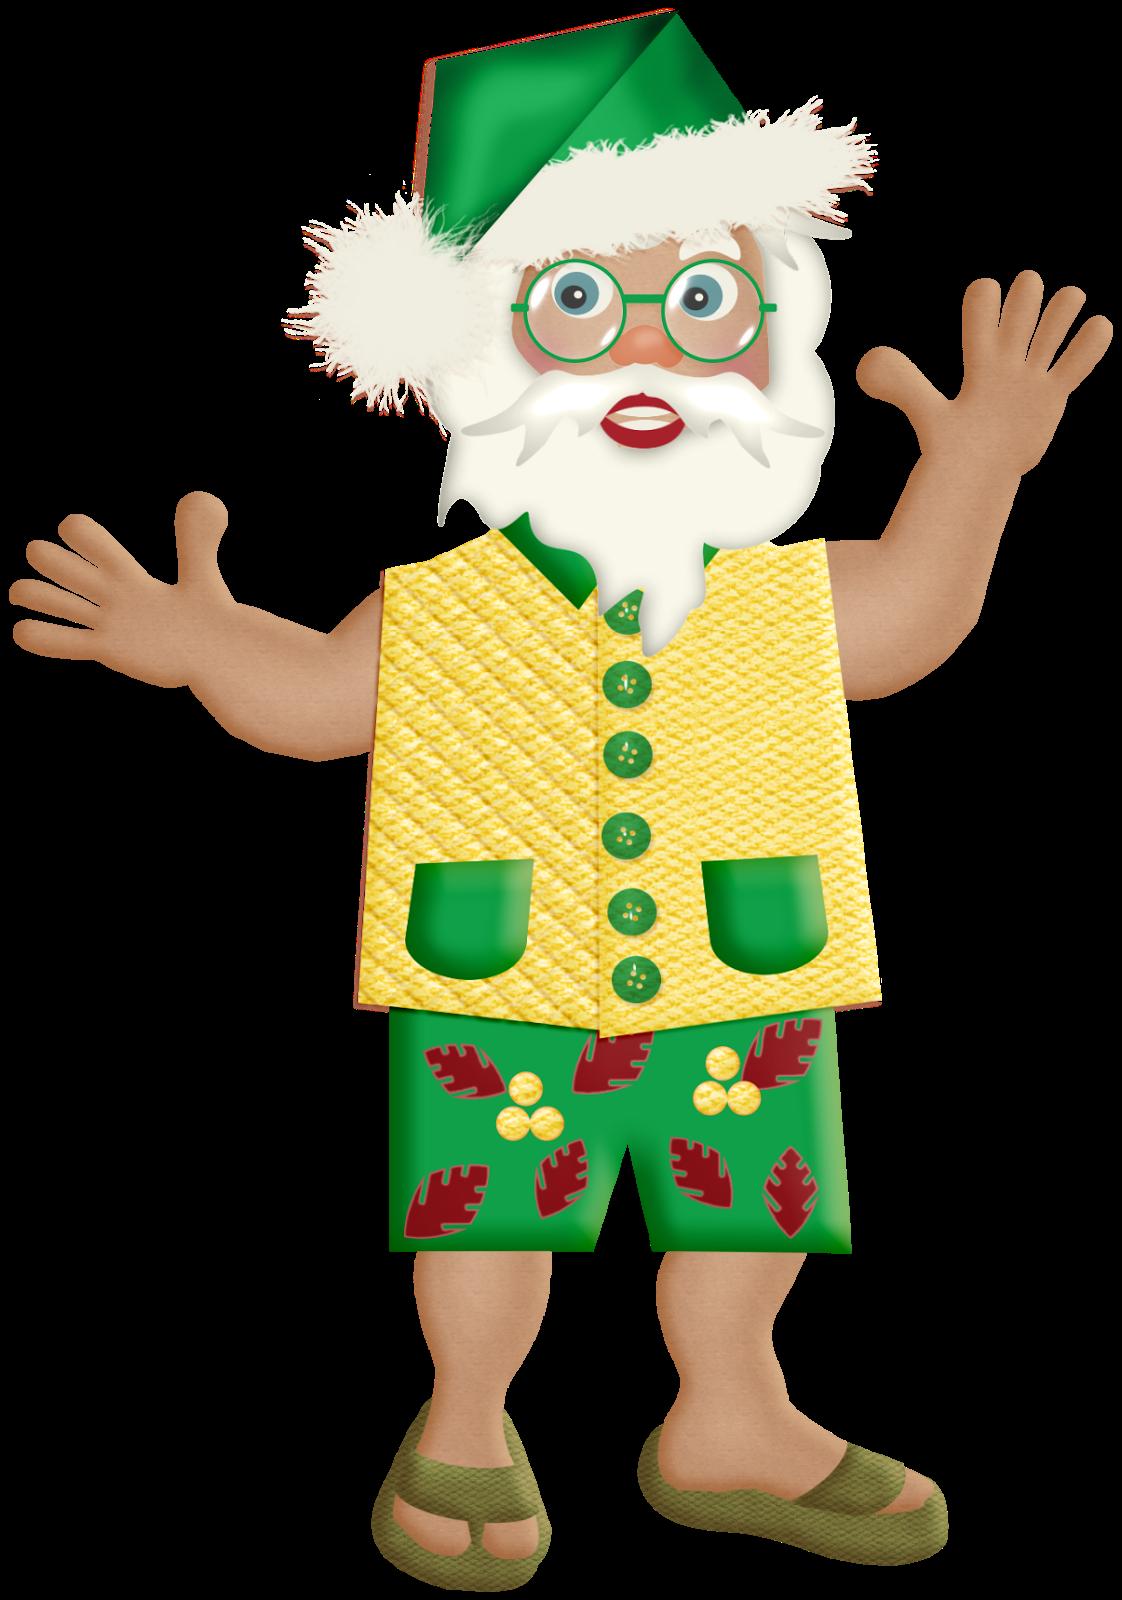 http://1.bp.blogspot.com/-7Fh7iQ182Kc/U9CjlgoEixI/AAAAAAAAAk0/nTz_tYhkrhc/s1600/KSD-+Summer+Santa+CU+Freebie.png